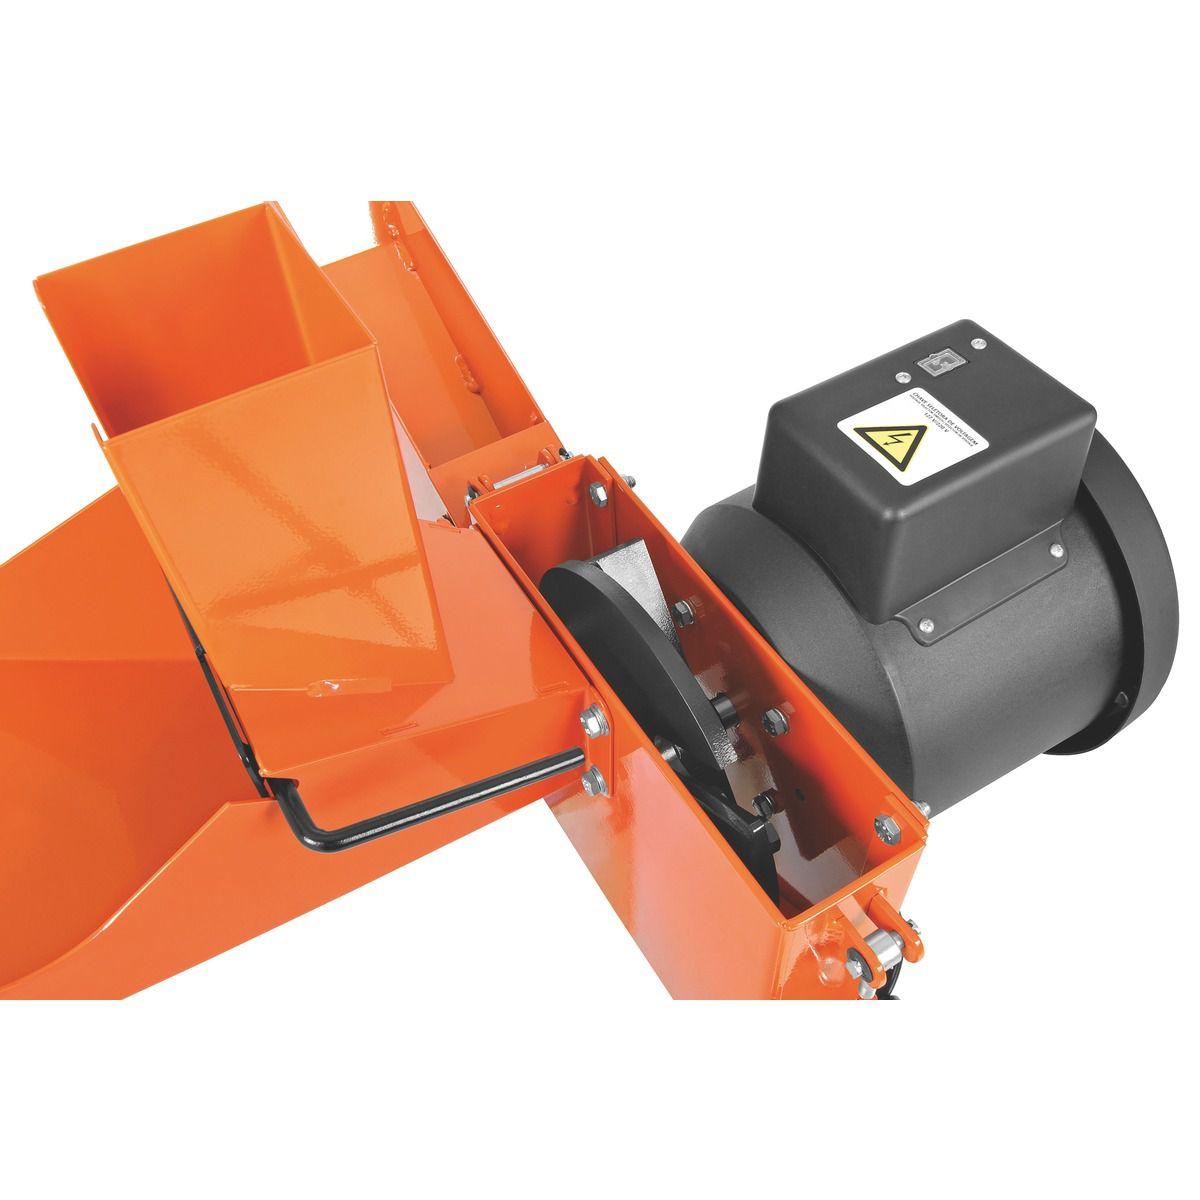 Triturador Elétrico de Galhos TRE25 / 2HP - Tramontina  - MCZ FORTES